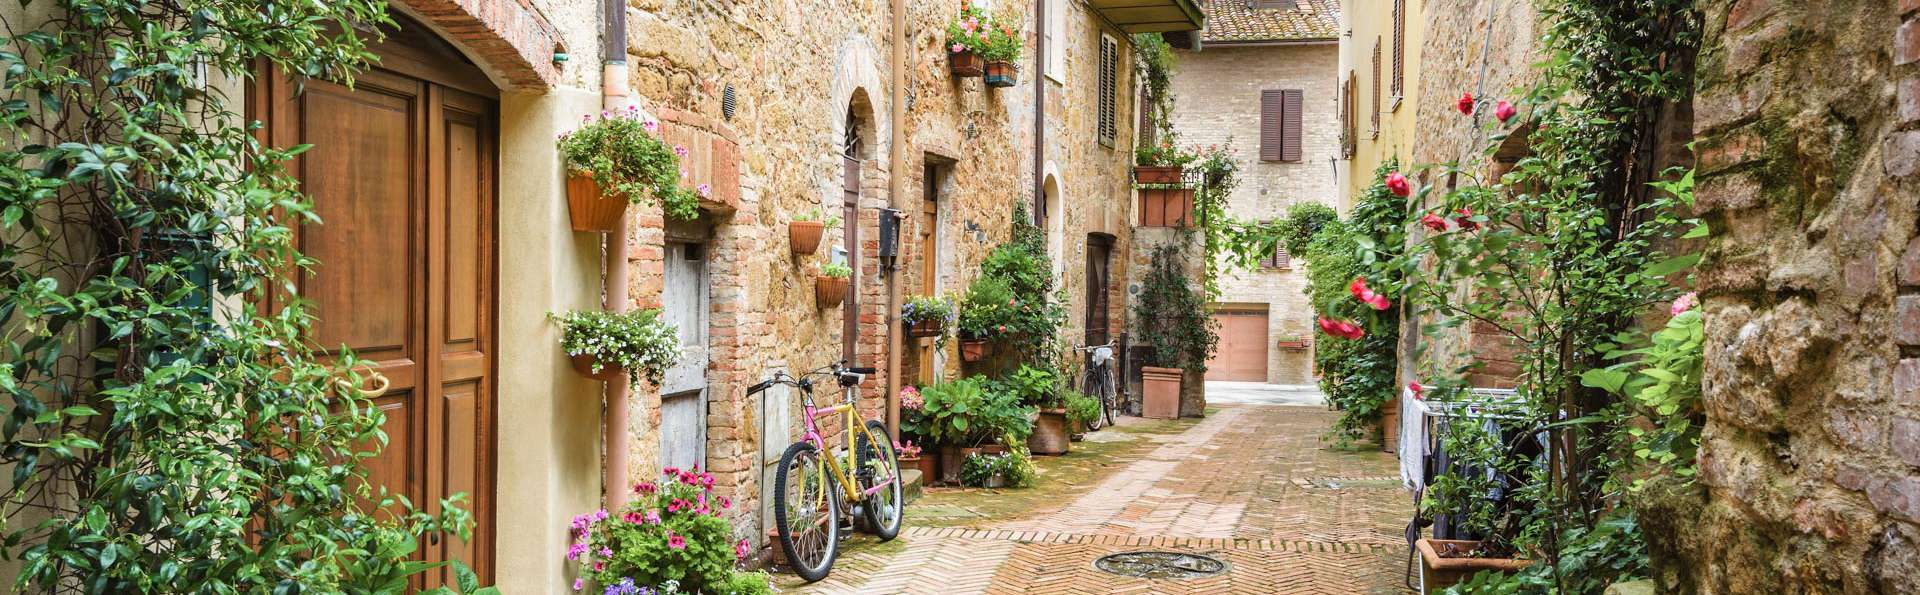 Casa Camaldoli - Historic Capitano Collection  - EDIT_PIENZA_05.jpg